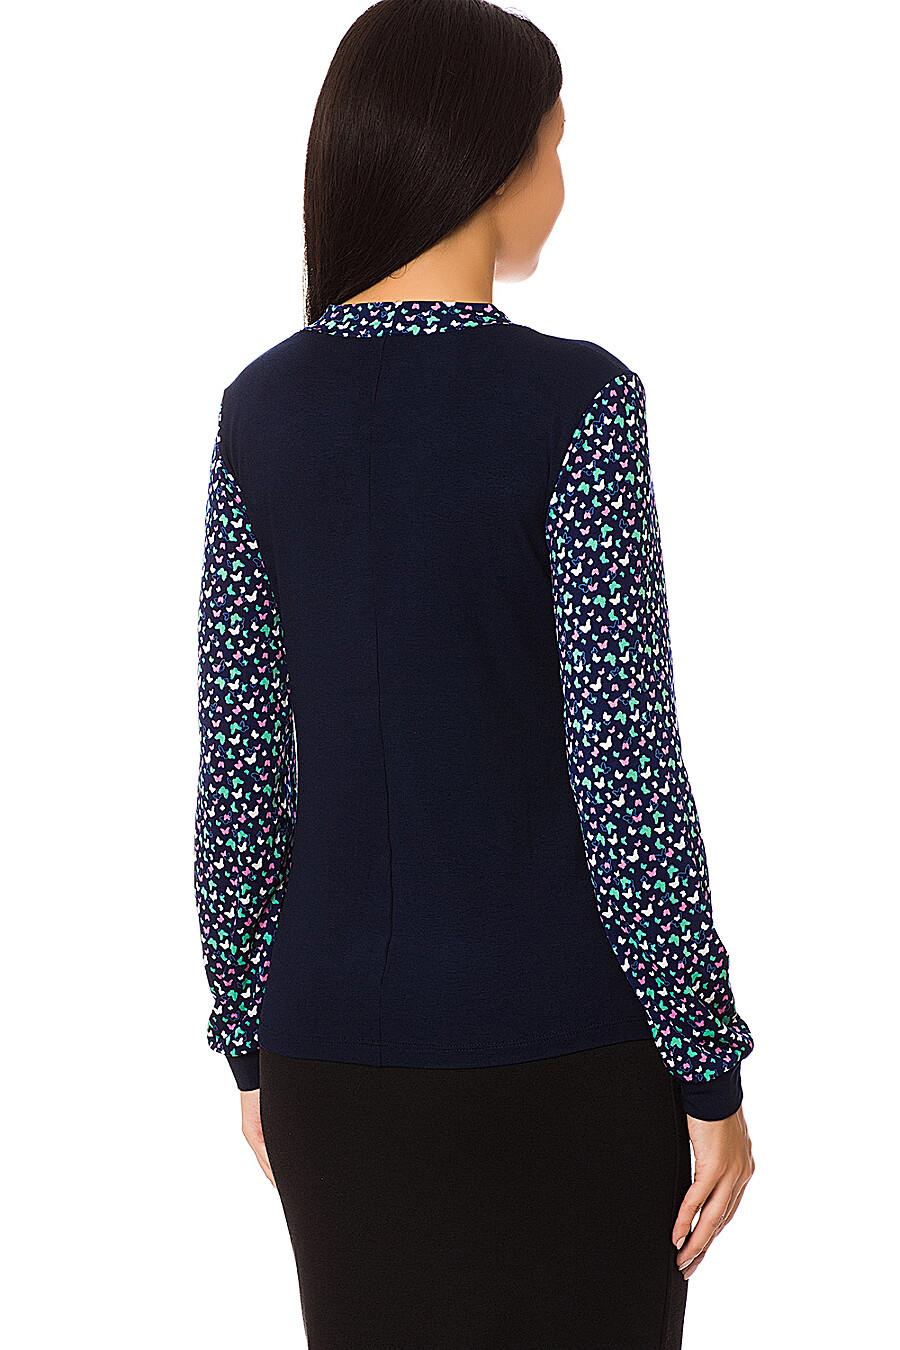 Блузка #66429